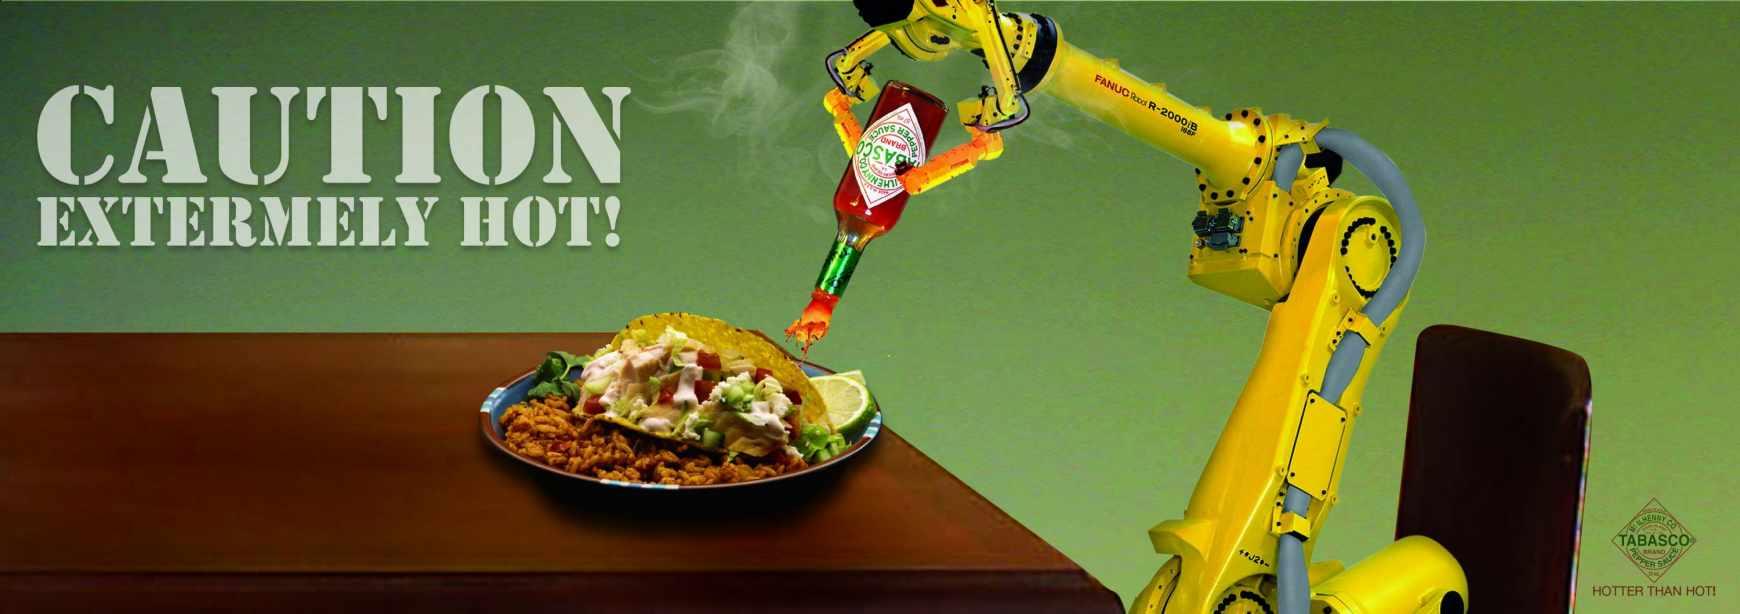 Ad for Tobasco  Sauce